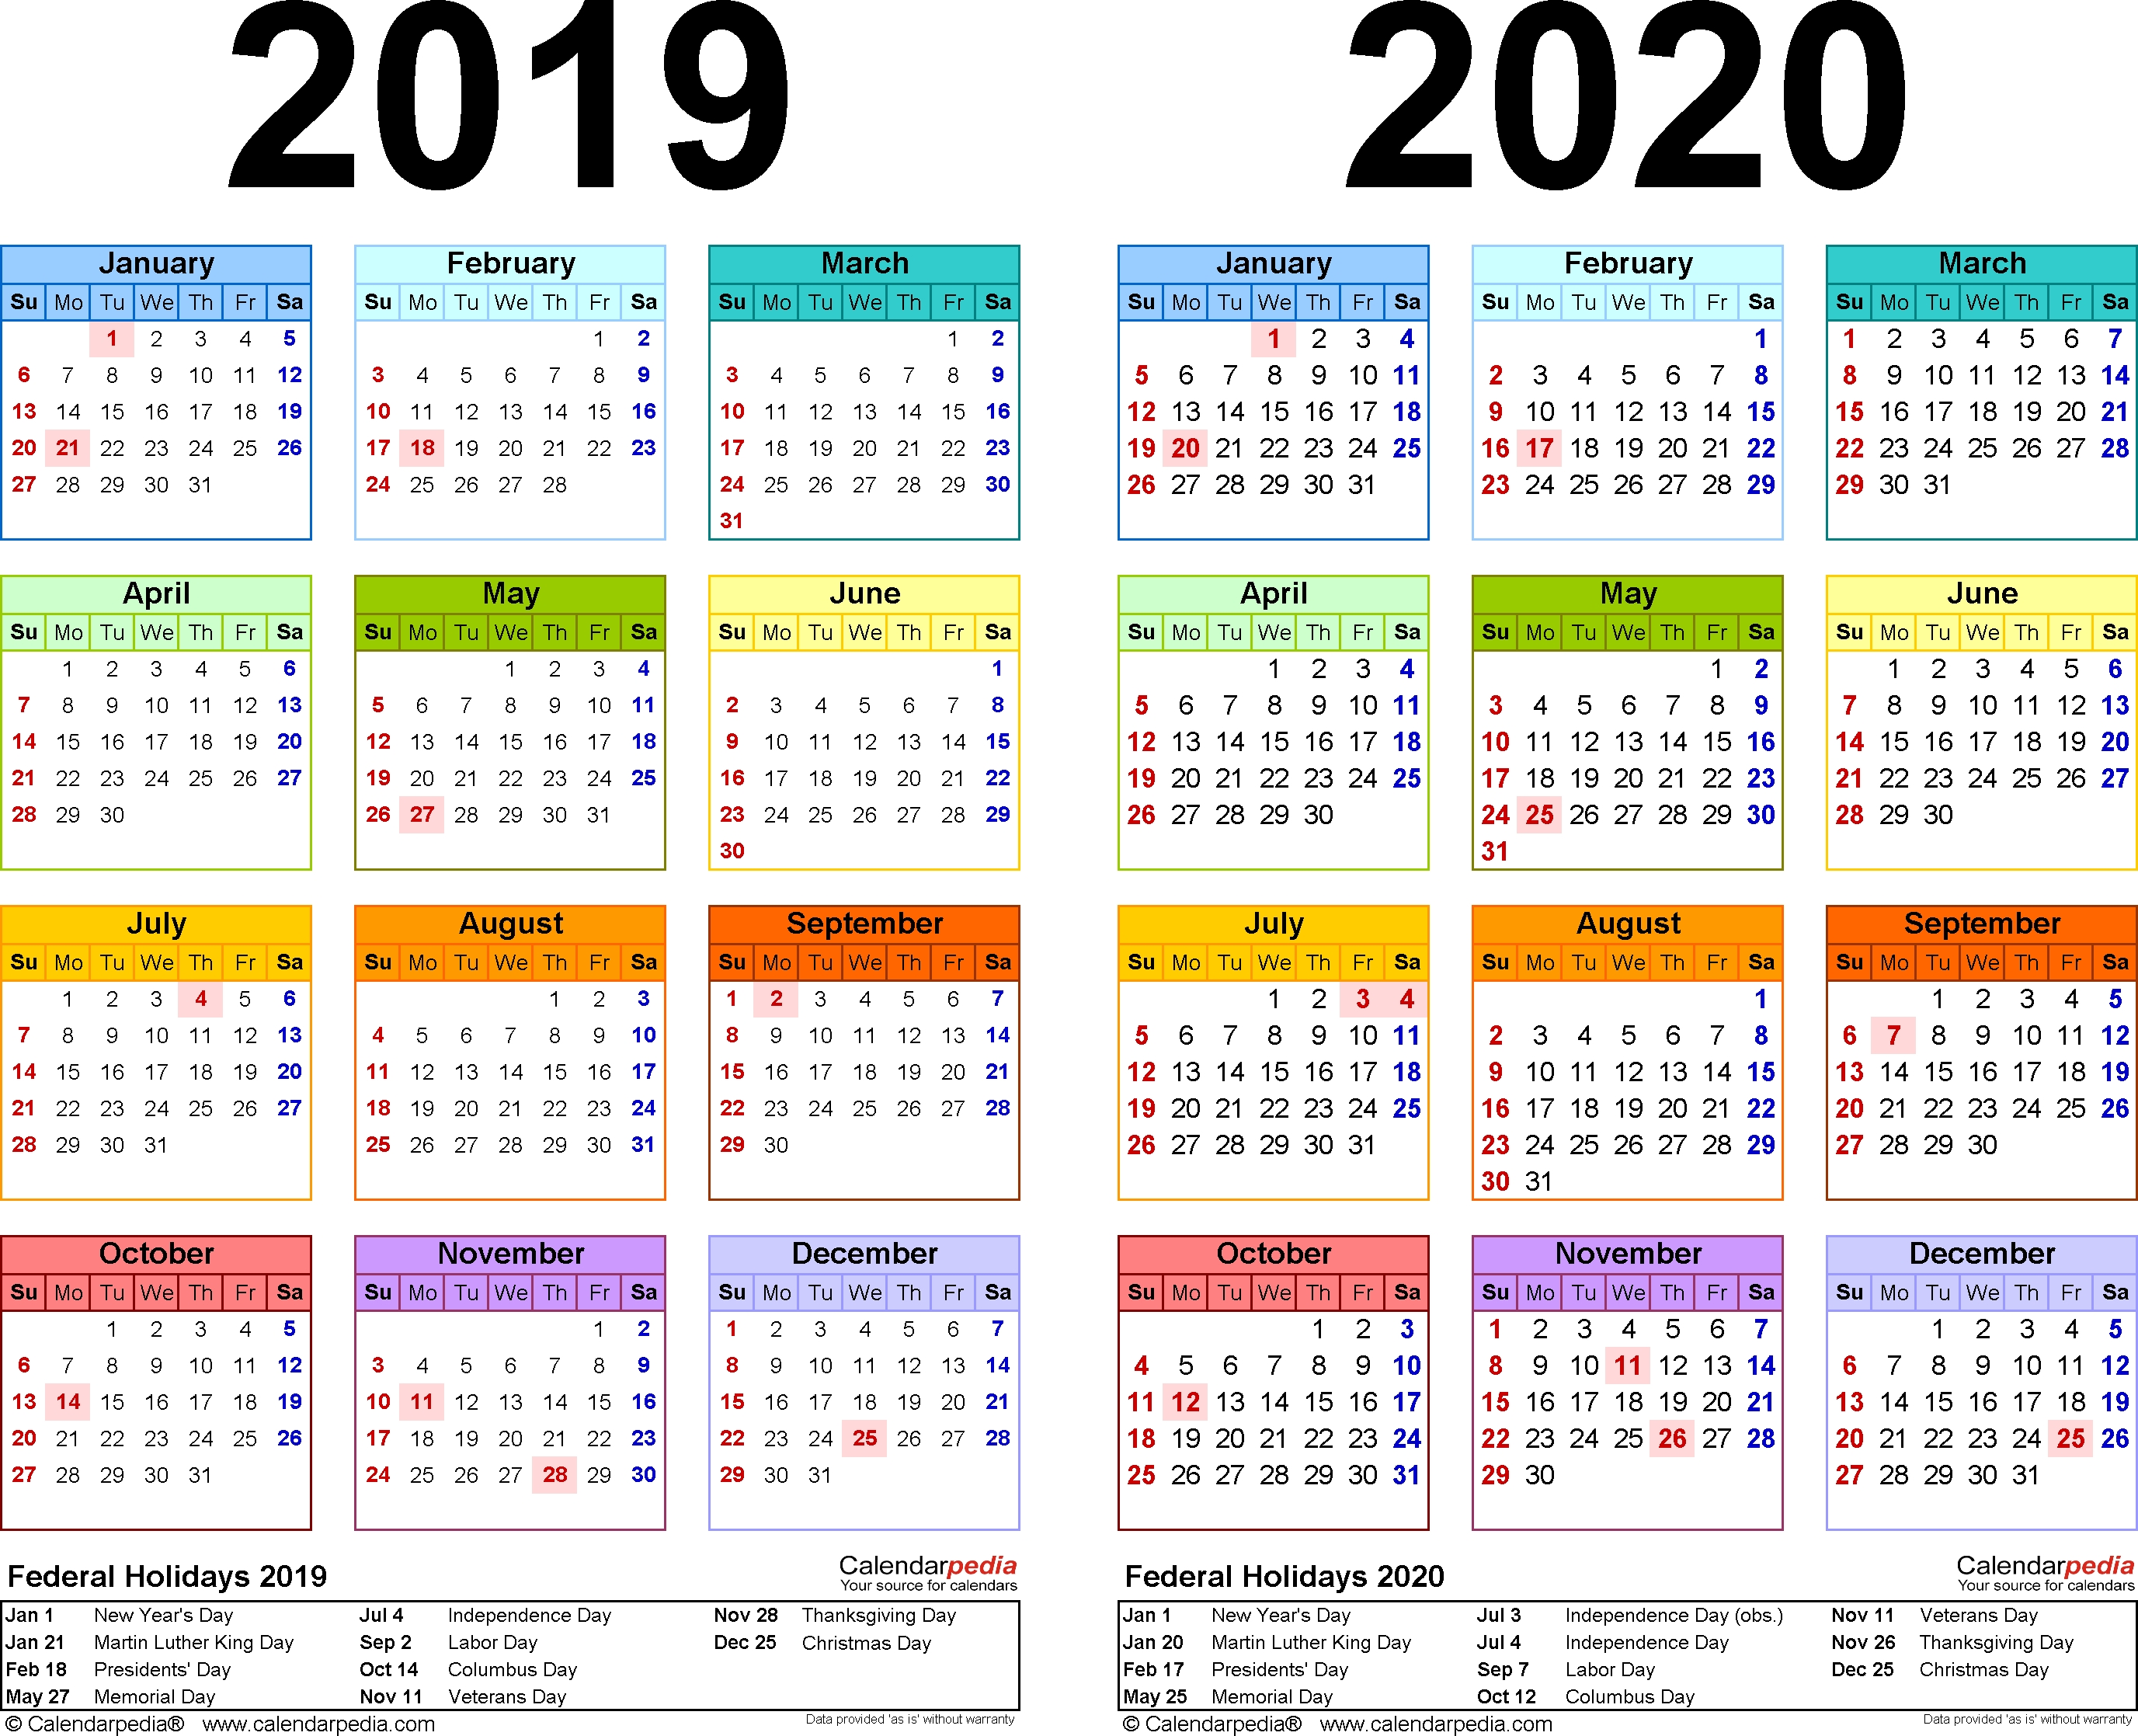 2019-2020 Calendar - Free Printable Two-Year Excel Calendars regarding Edit Free Calendar Template 2019-2020